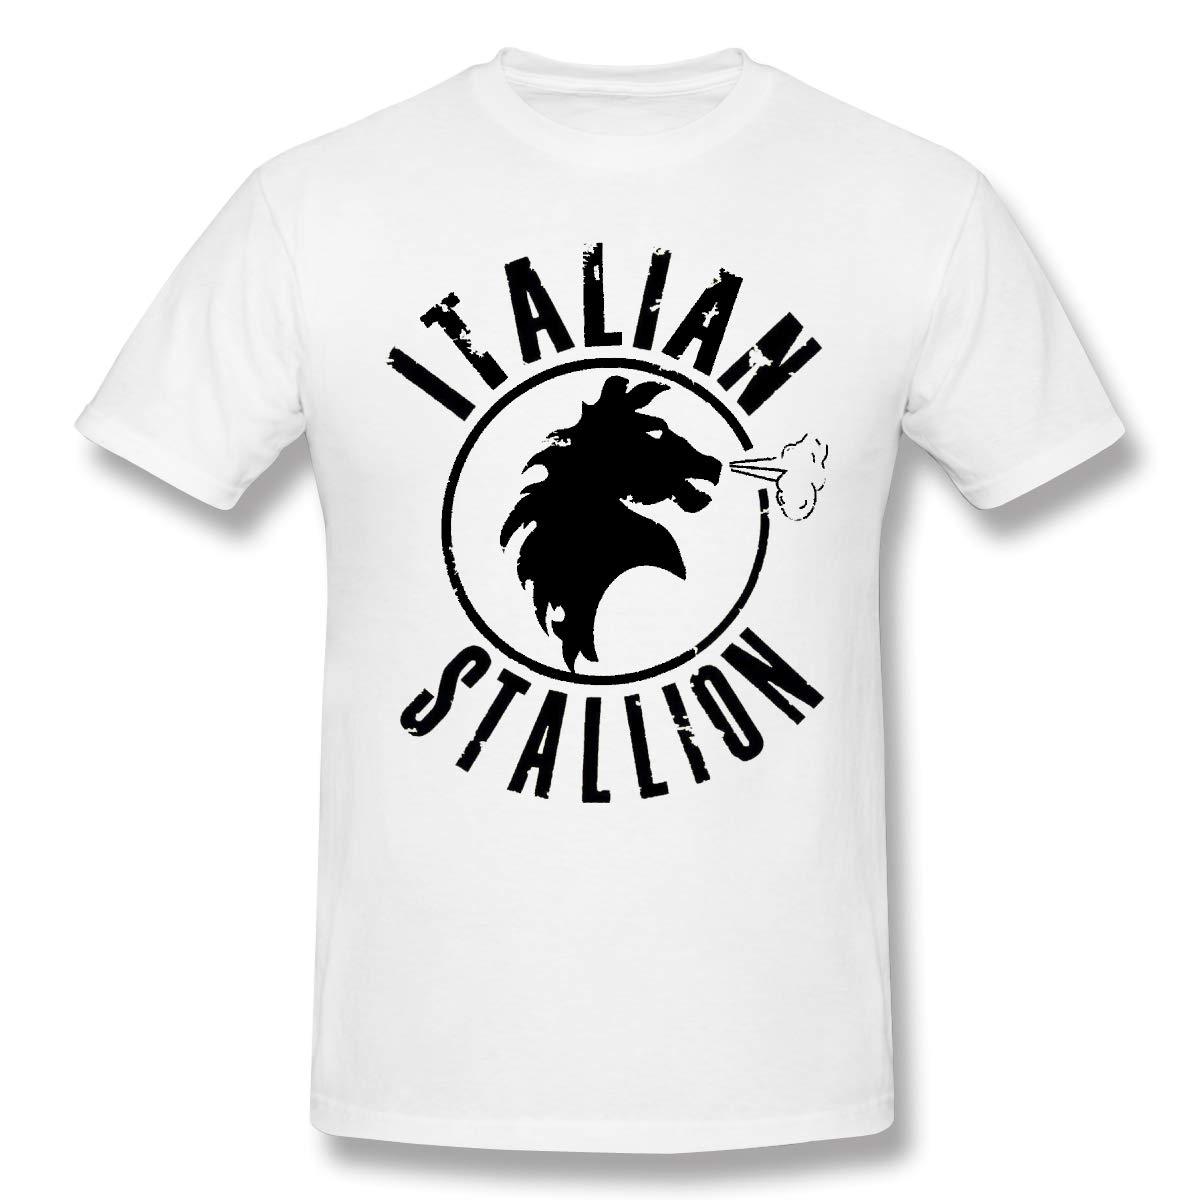 Rocky Balboa Italian Stallion Movie S T Shirt Fashion Short Sleeves Man S T